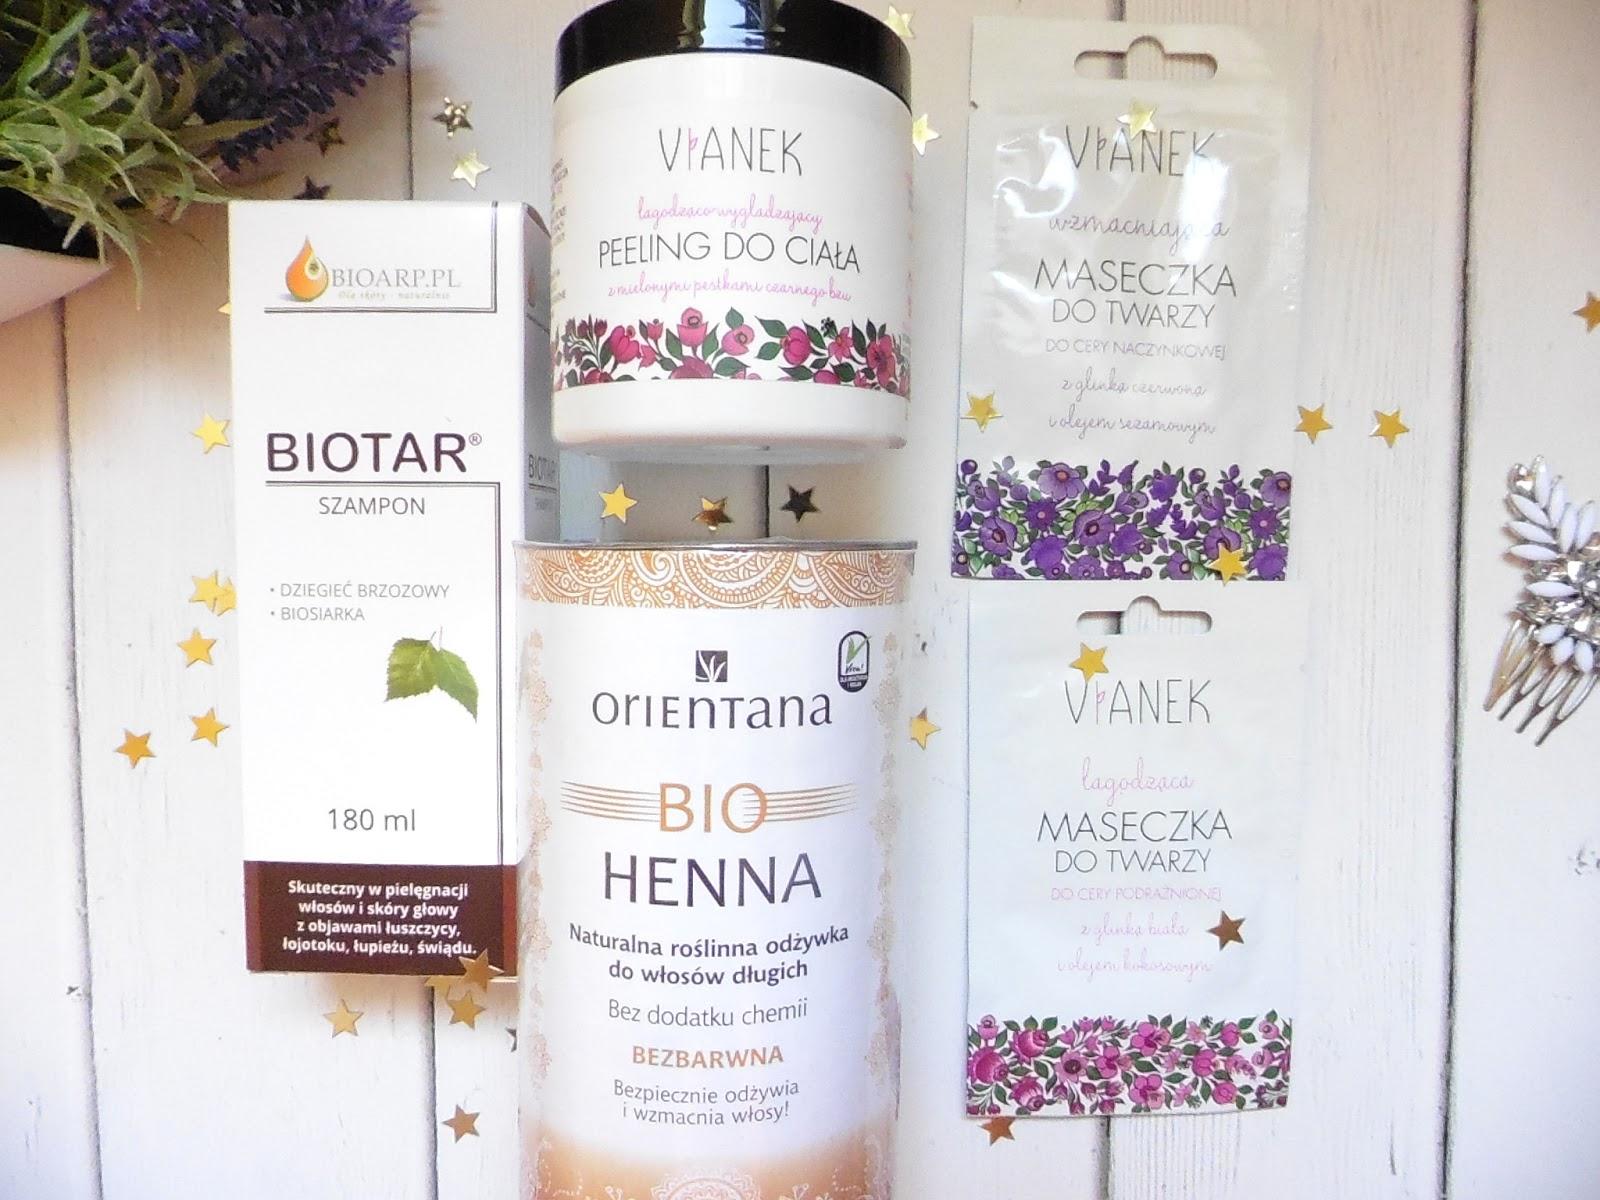 bio-henna-orientana,peeling-vianek, maseczka-vianek, szampon-biotar